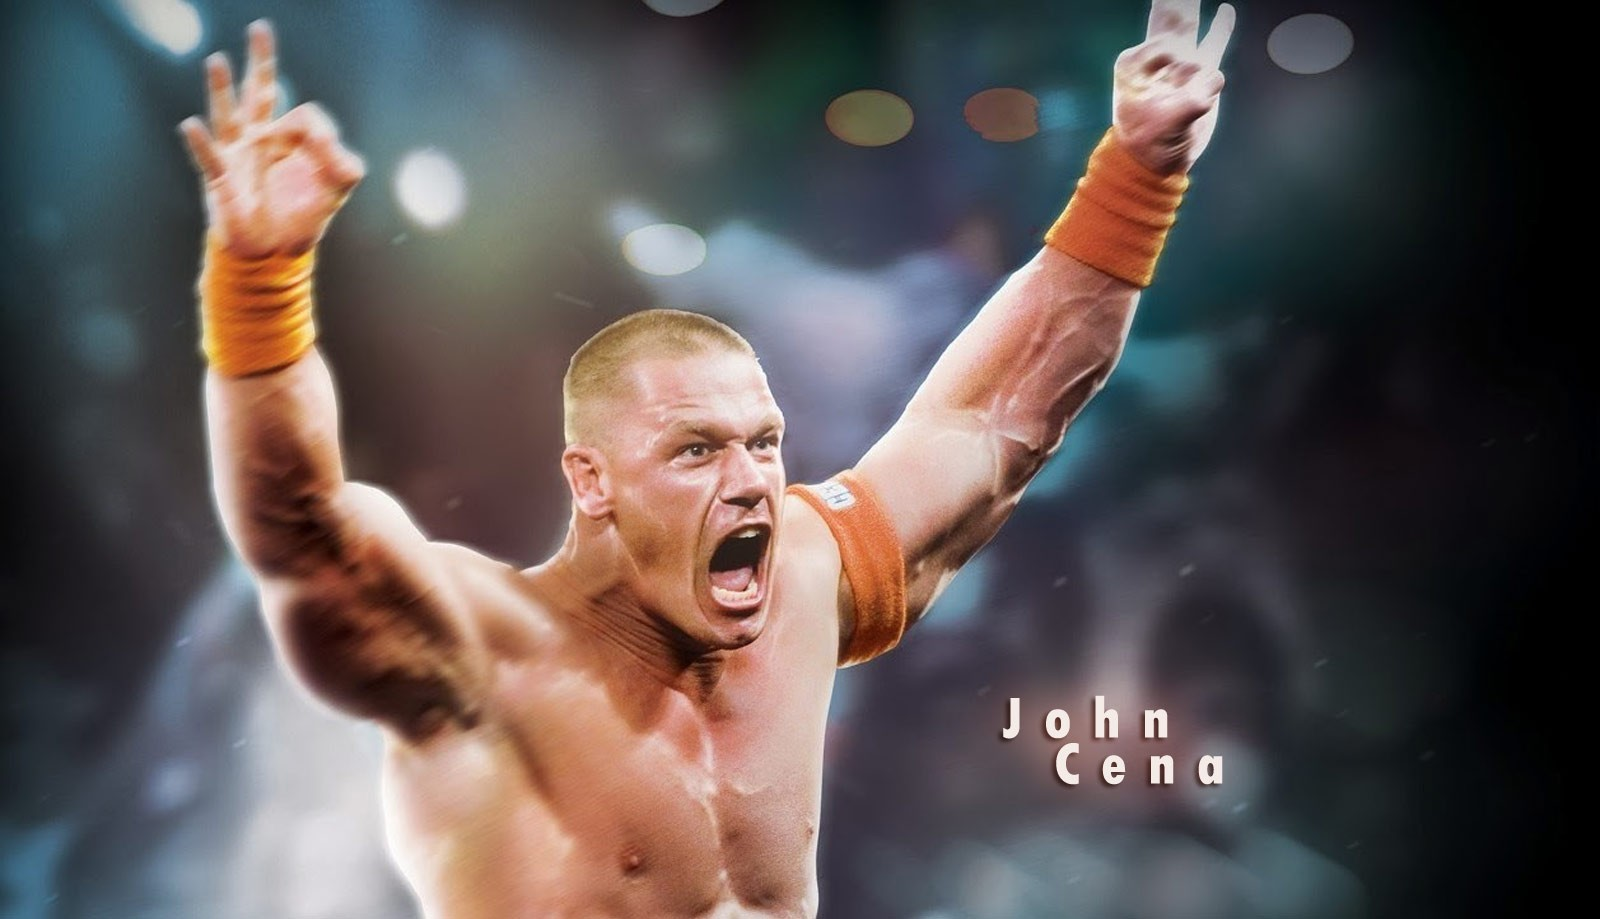 Wwe John Cena Background